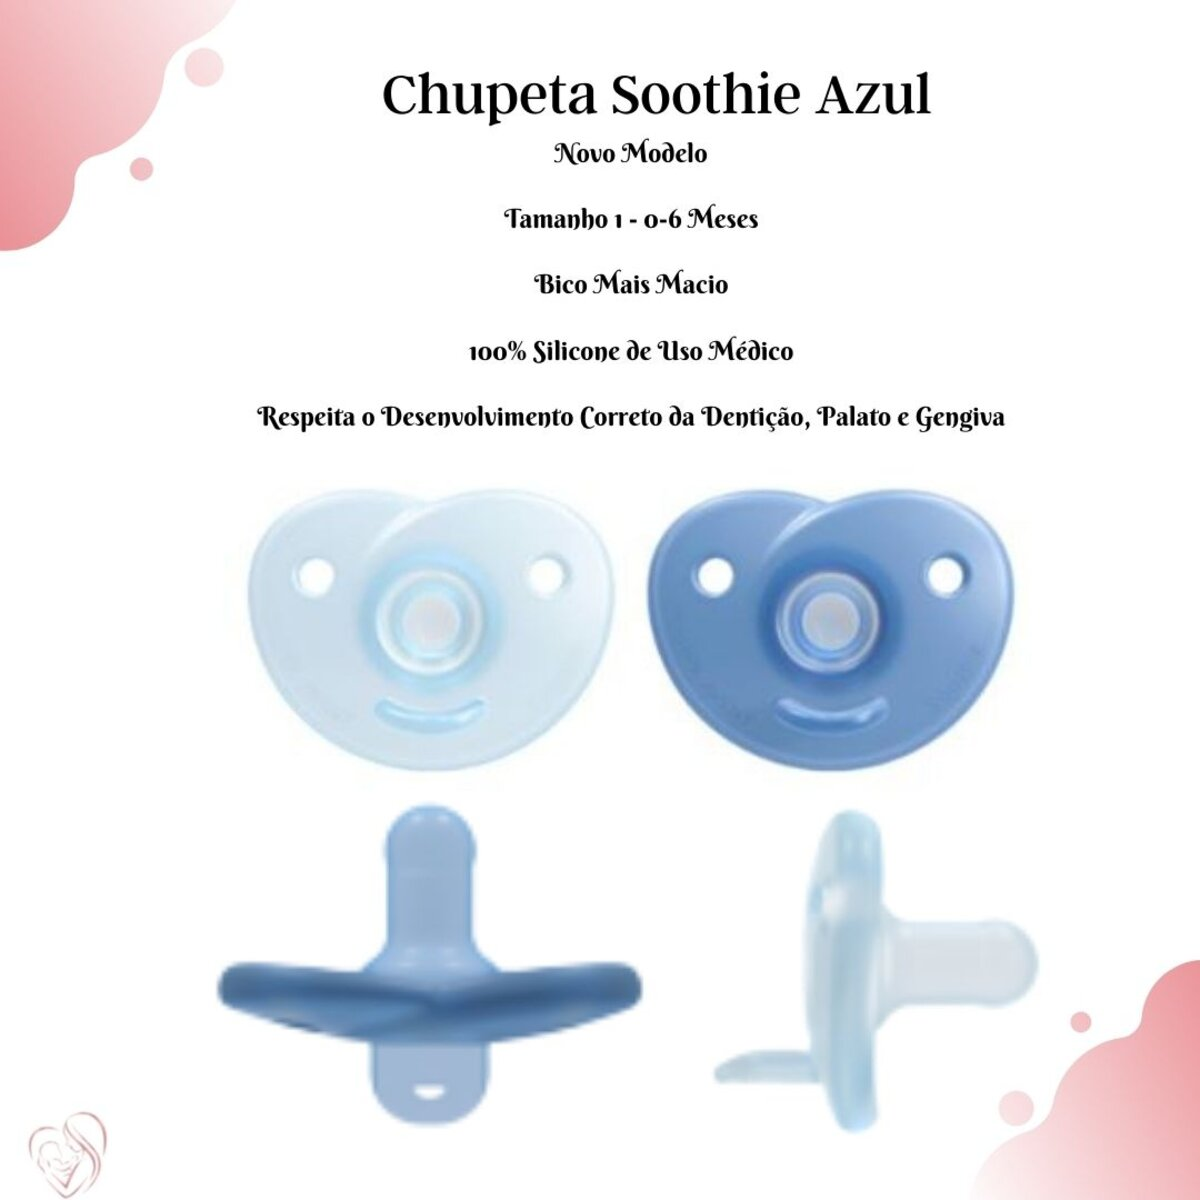 Chupeta Soothie Azul 0-6 Meses Philips Avent  Nova